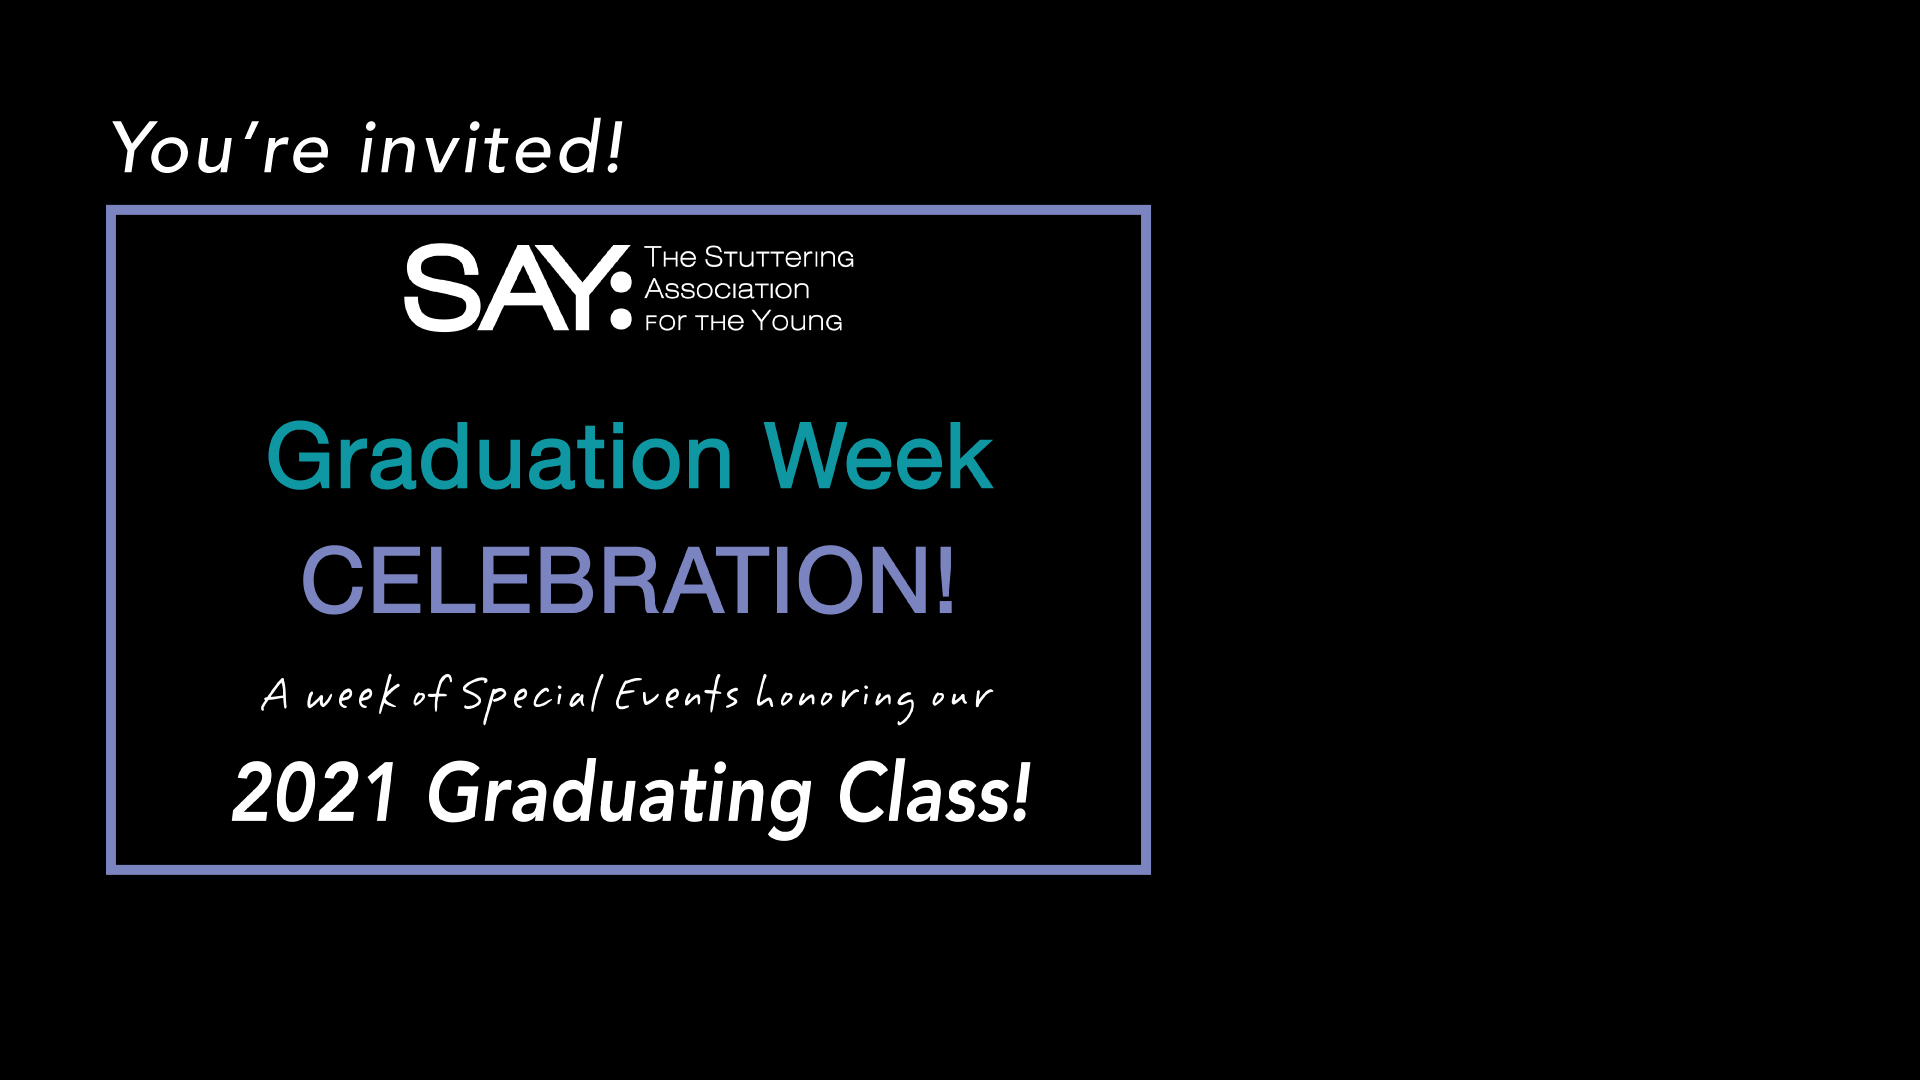 SAY's 2021 Graduation Week Celebration!